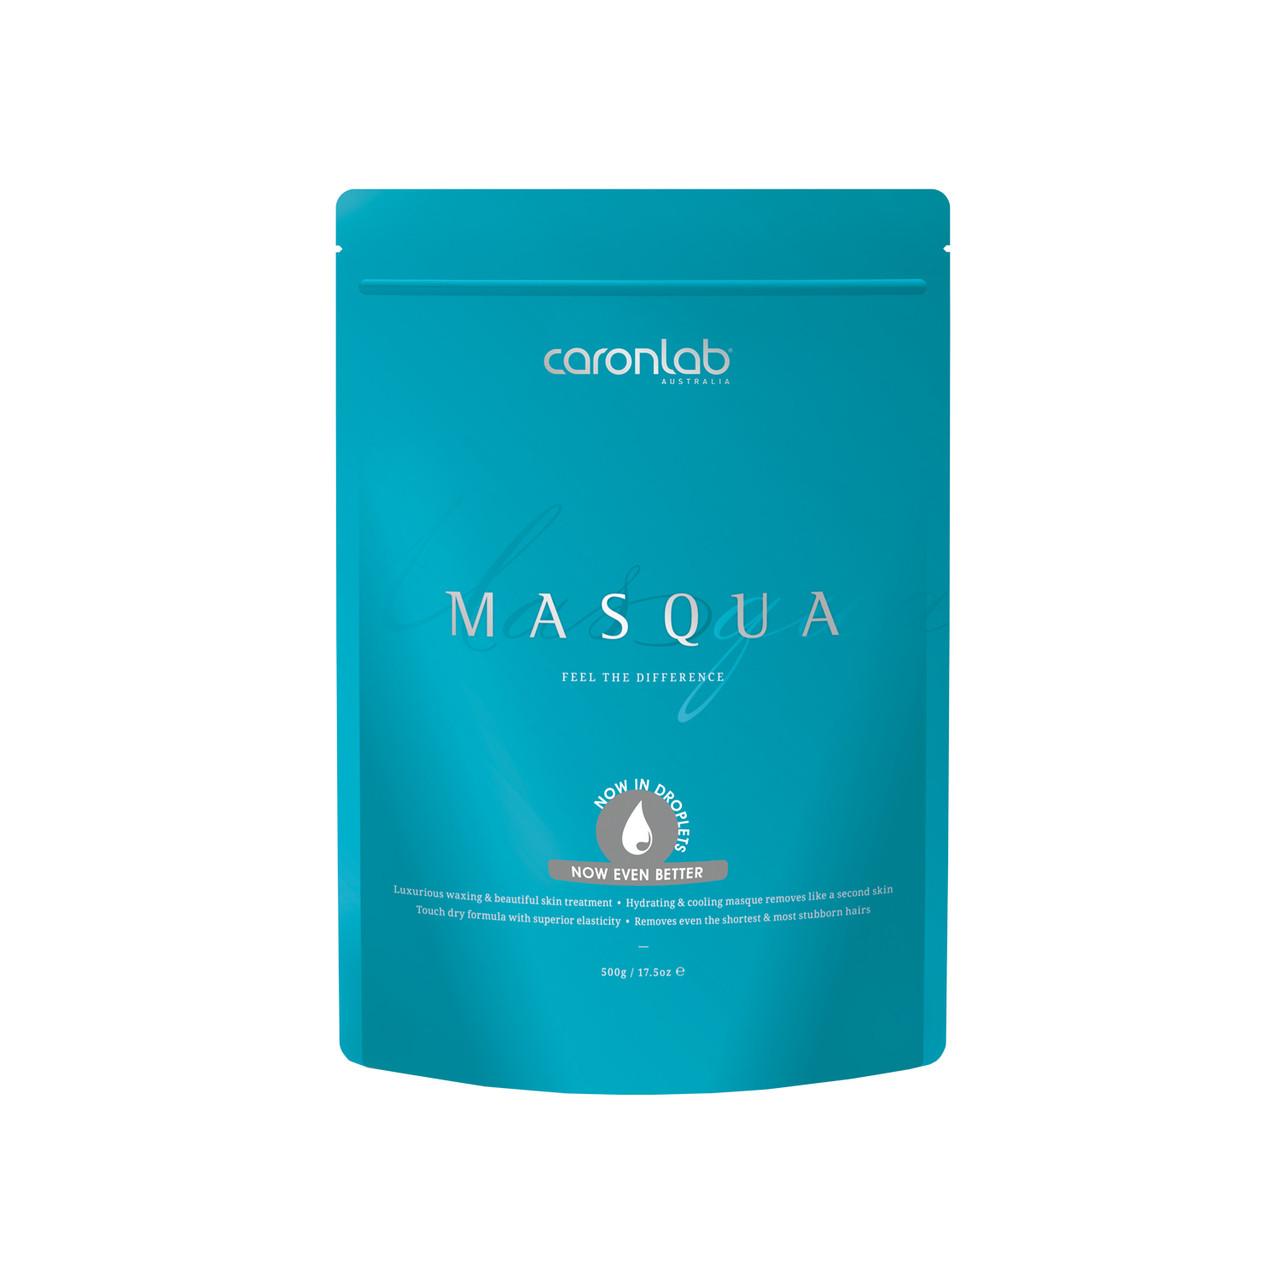 Masqua Hard Wax Beads 500g